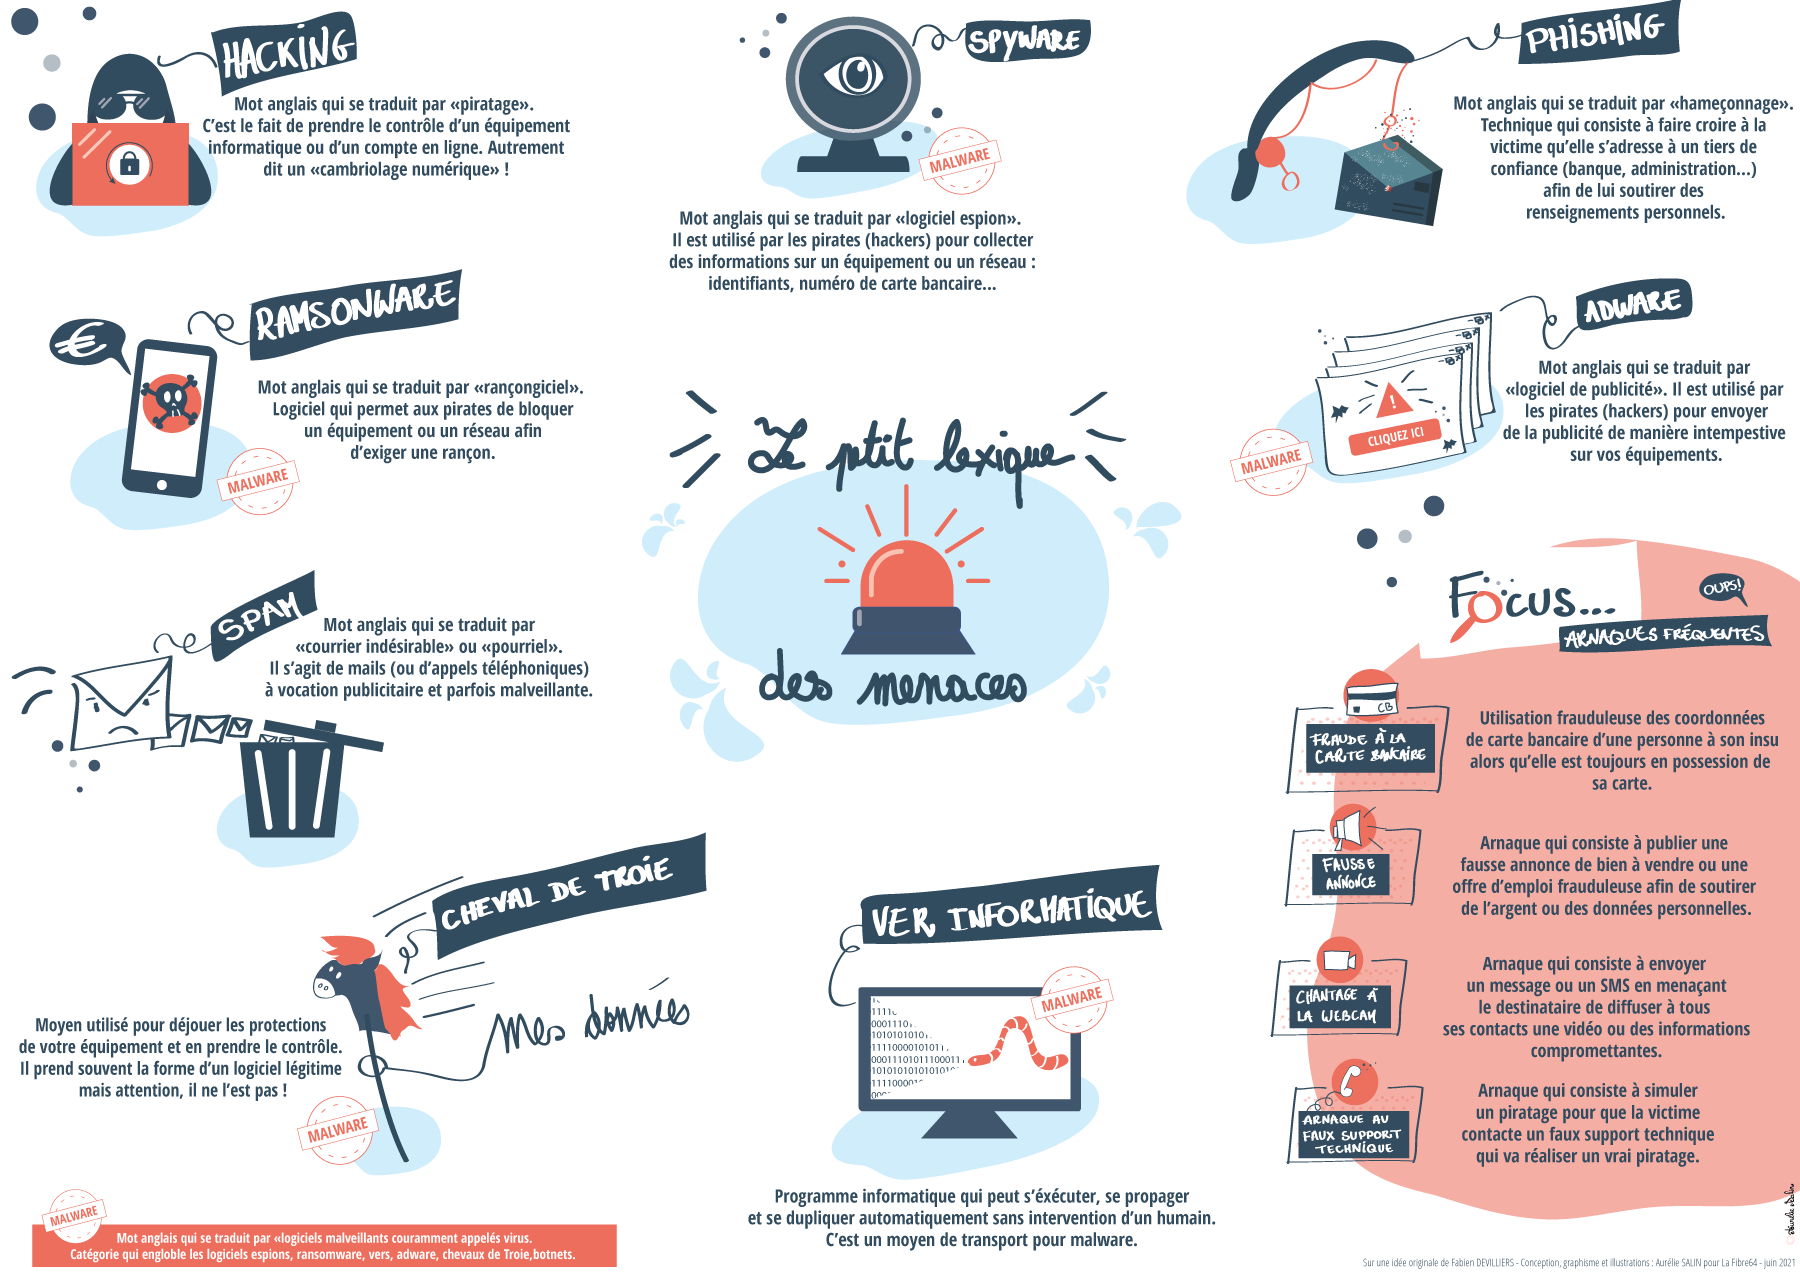 illustration-guide-cyber-menaces